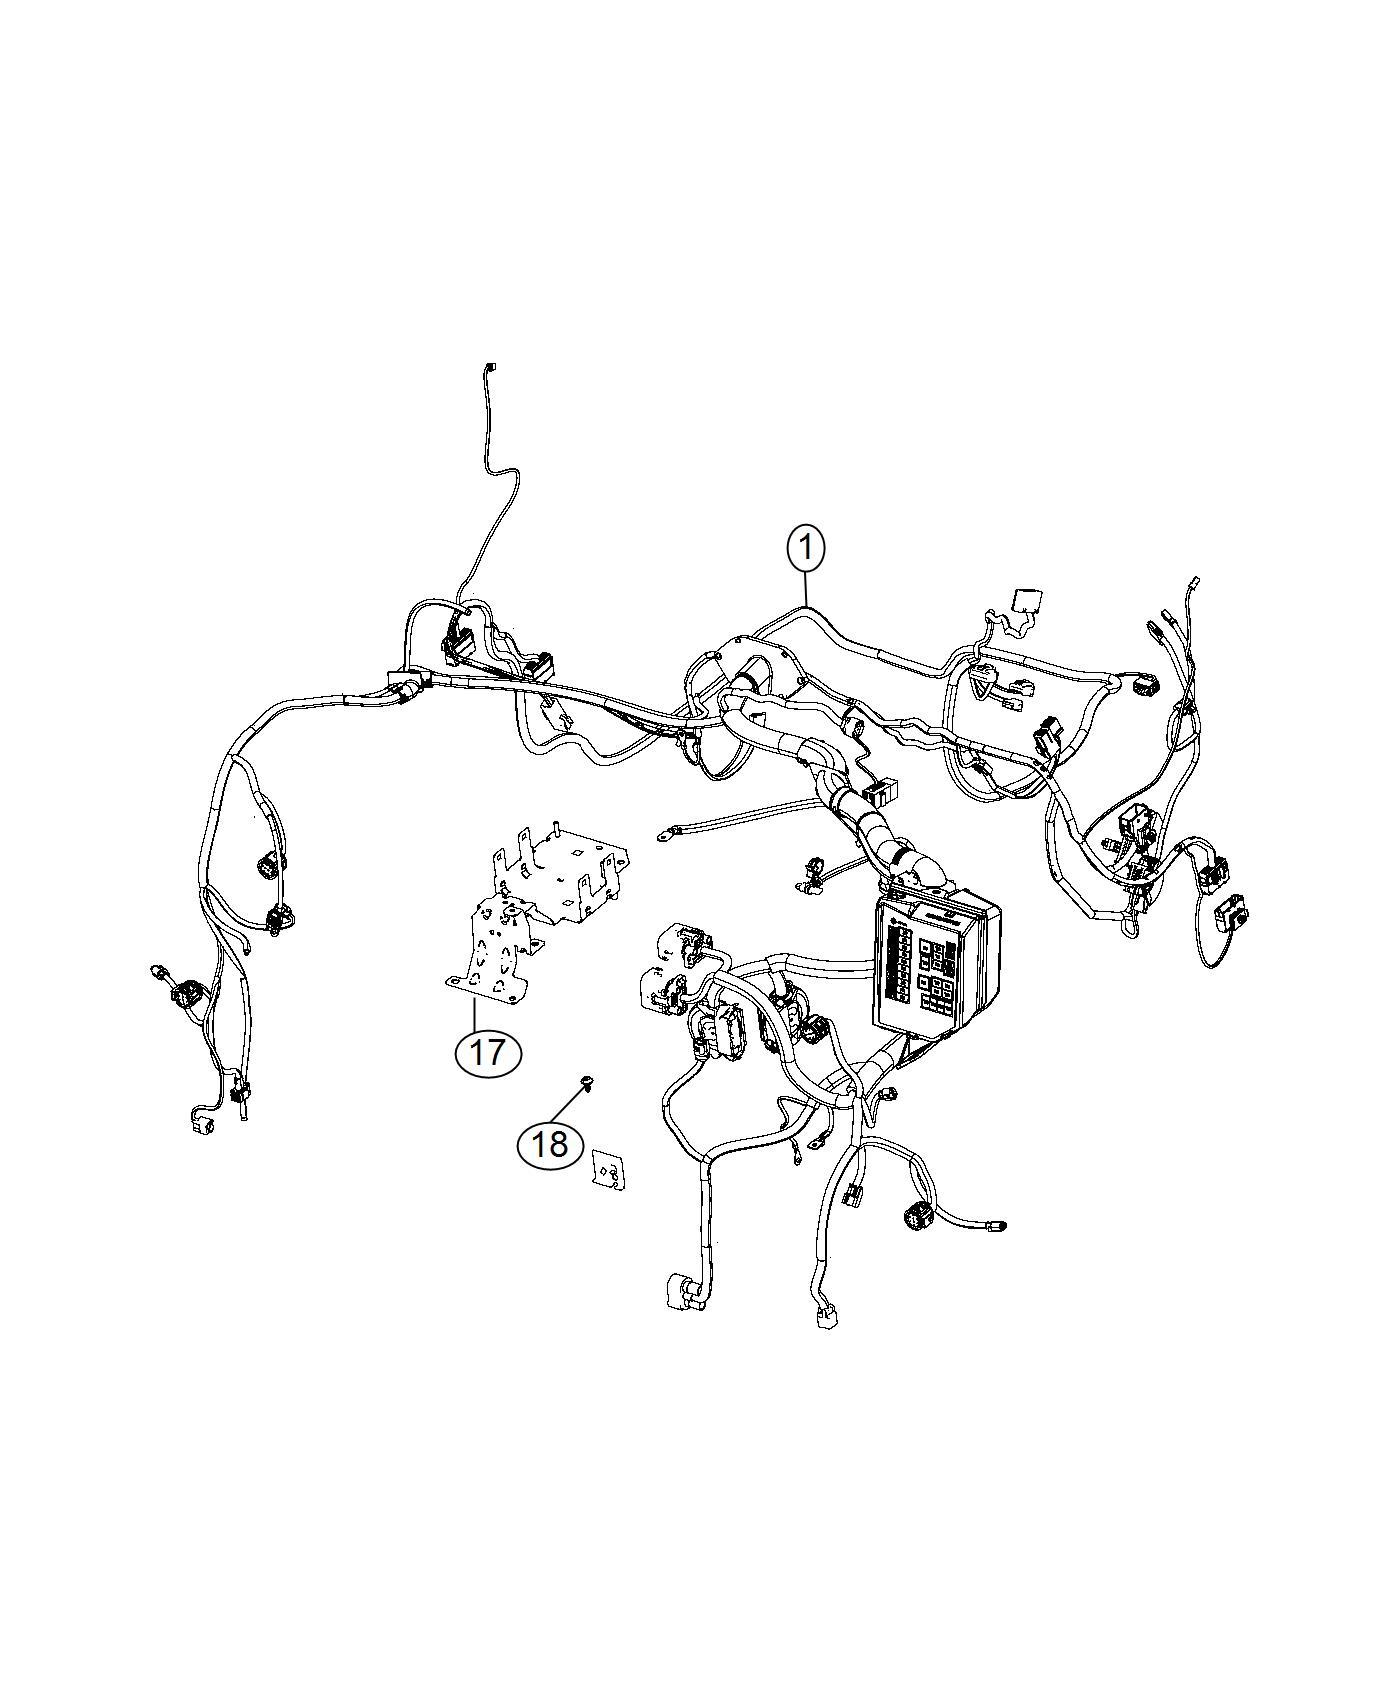 Fiat 500E Wiring. Headlamp to dash. Mopar, group